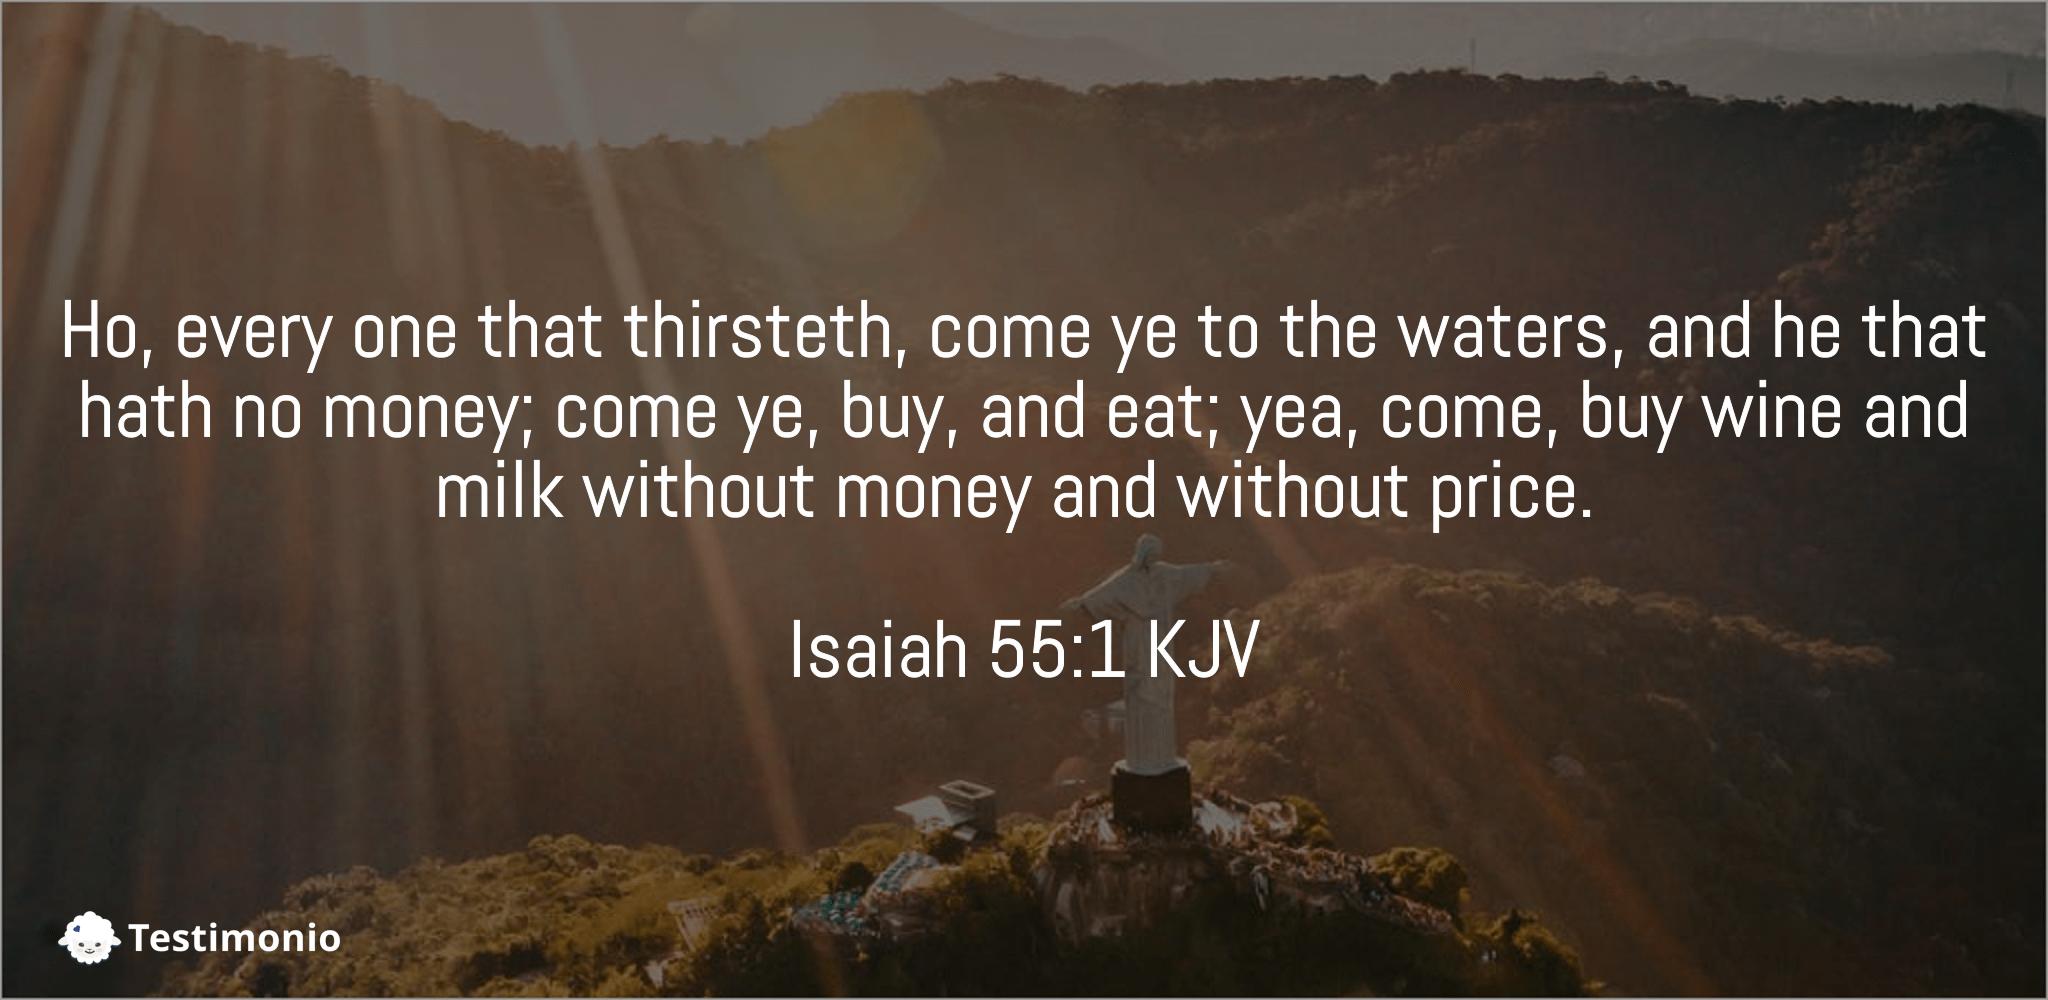 Isaiah 55:1